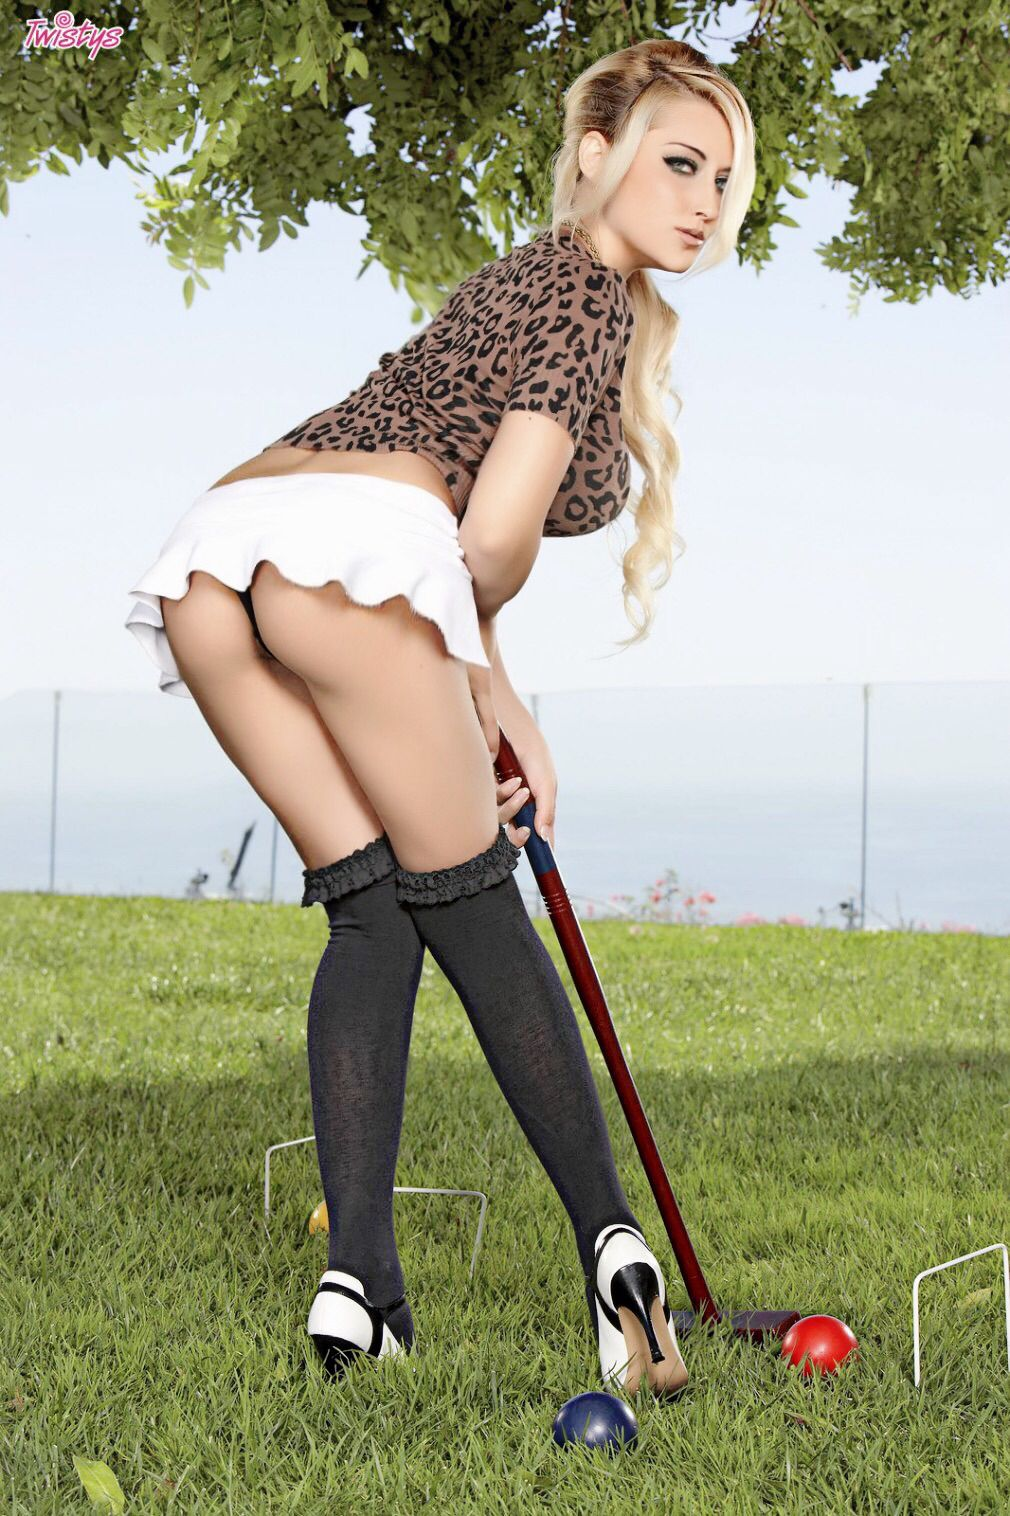 skirts golf girls Short